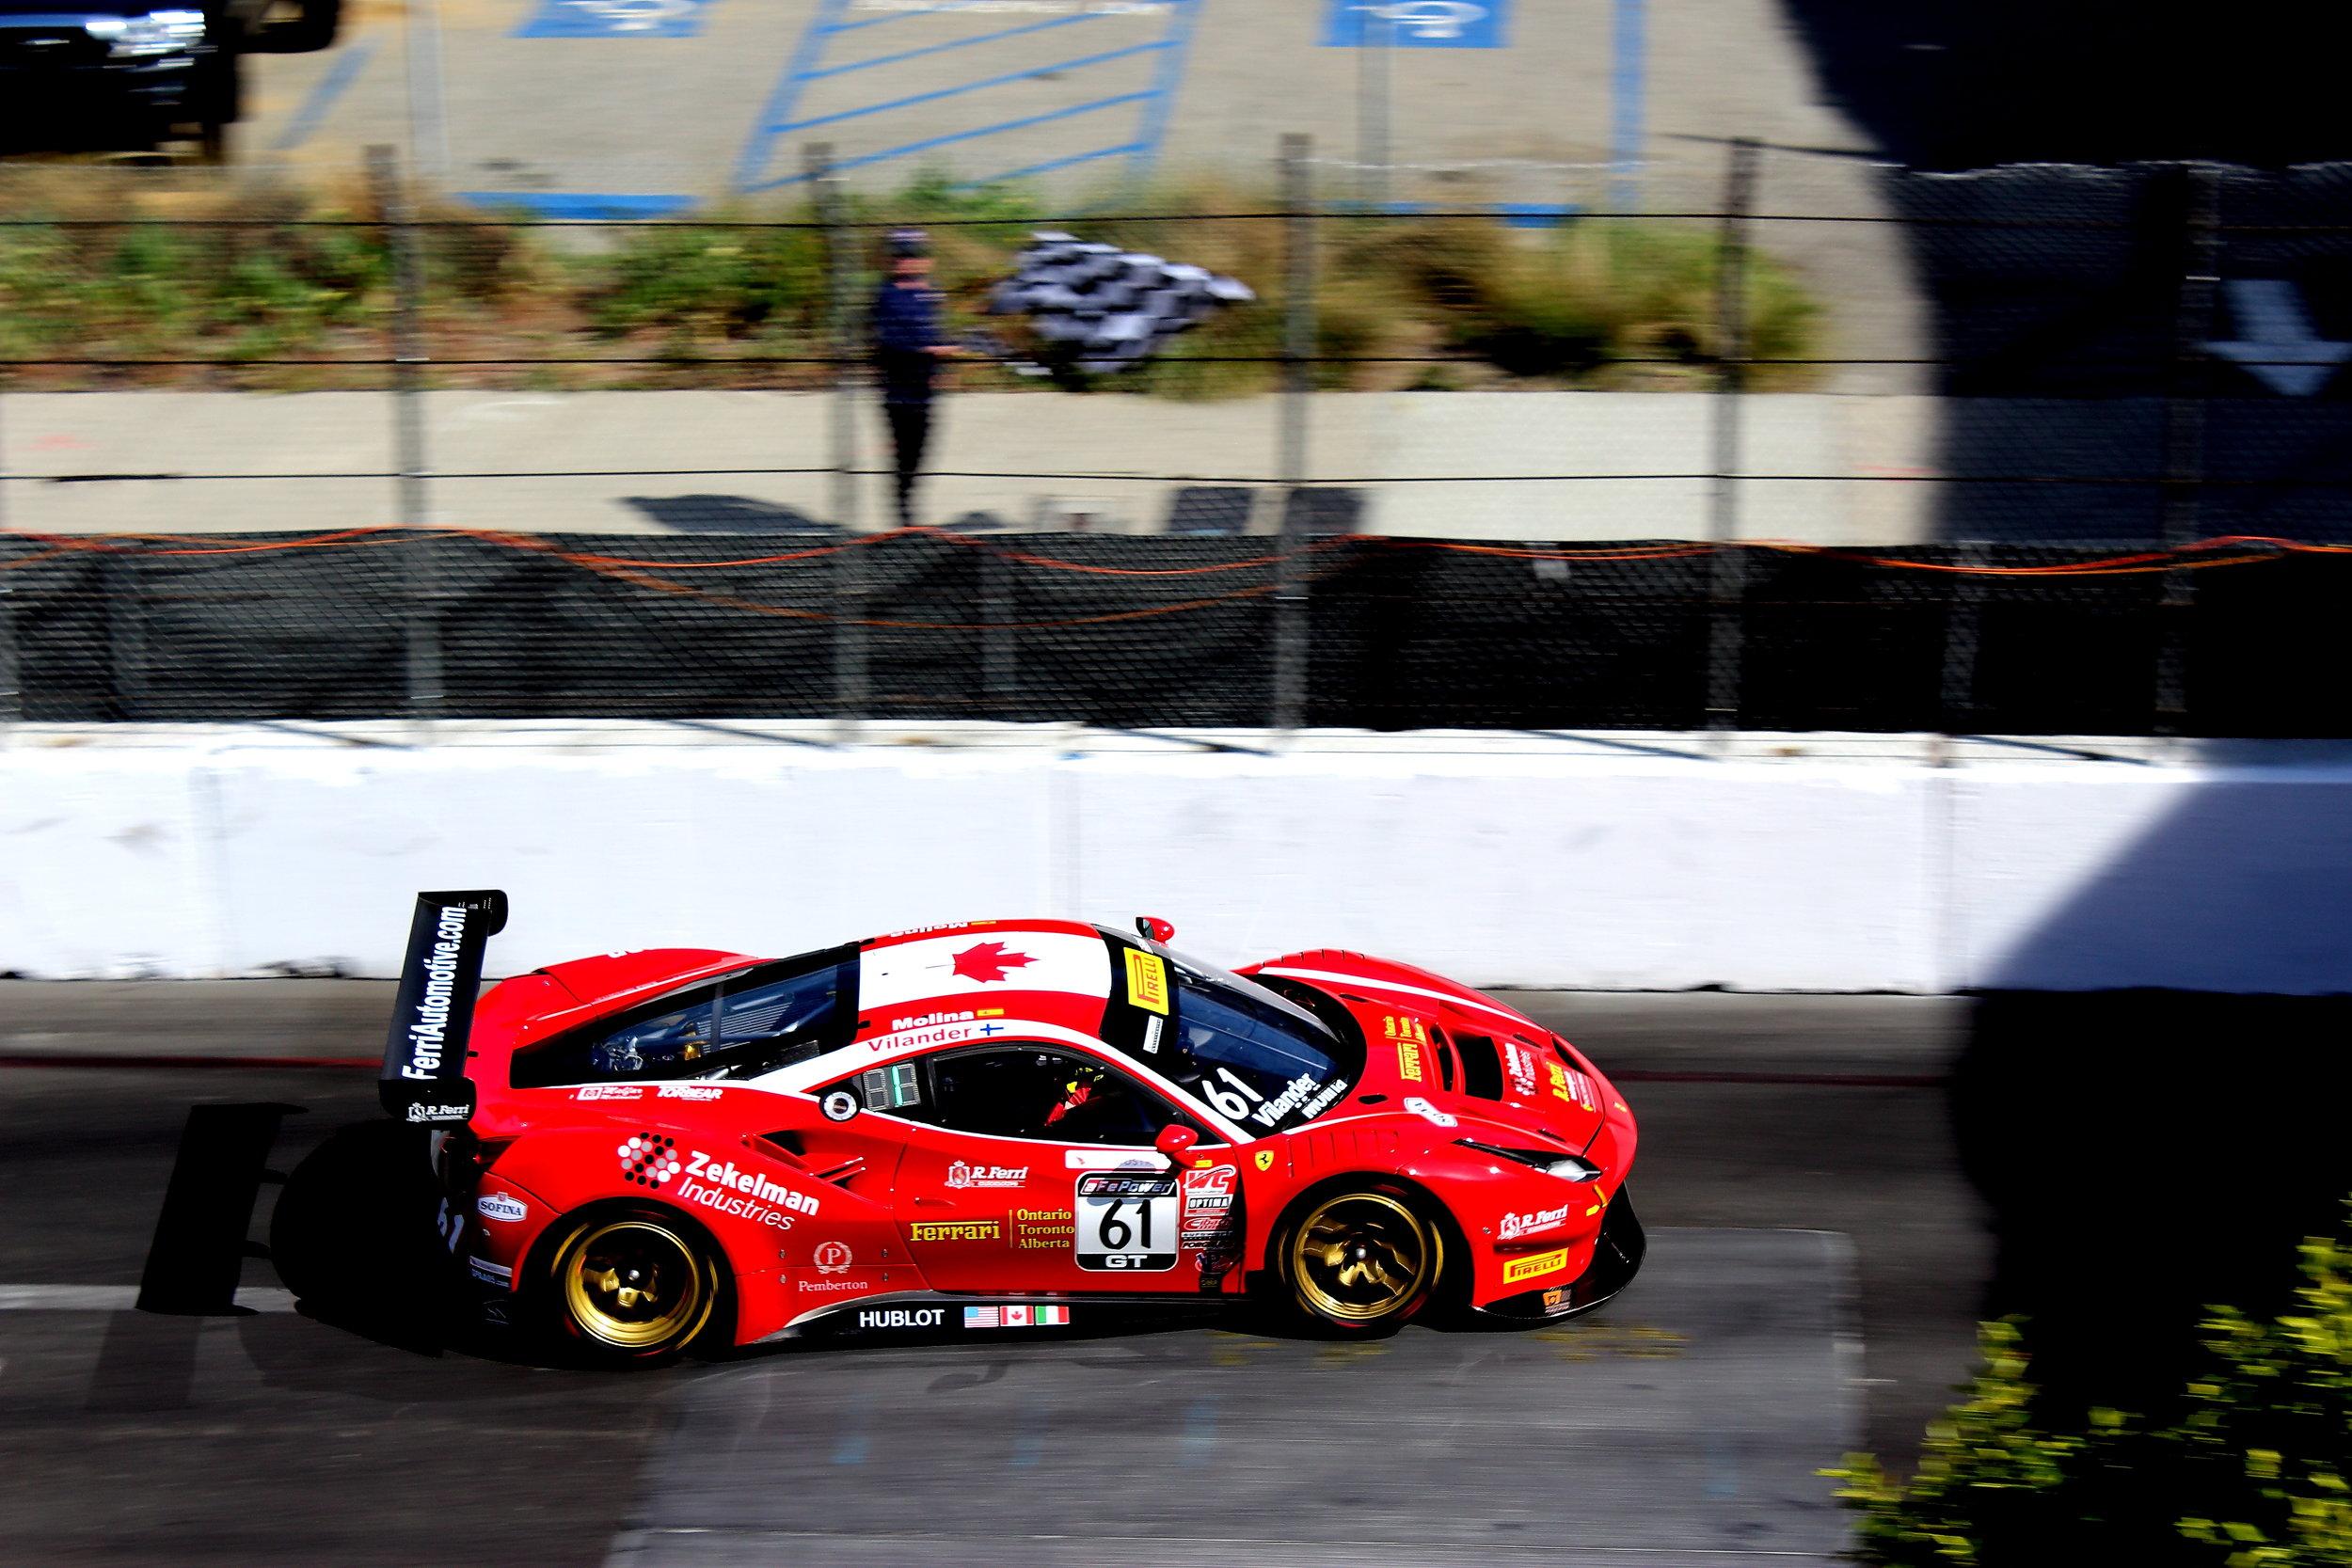 Ferrari (2018_05_16 22_29_53 UTC).JPG